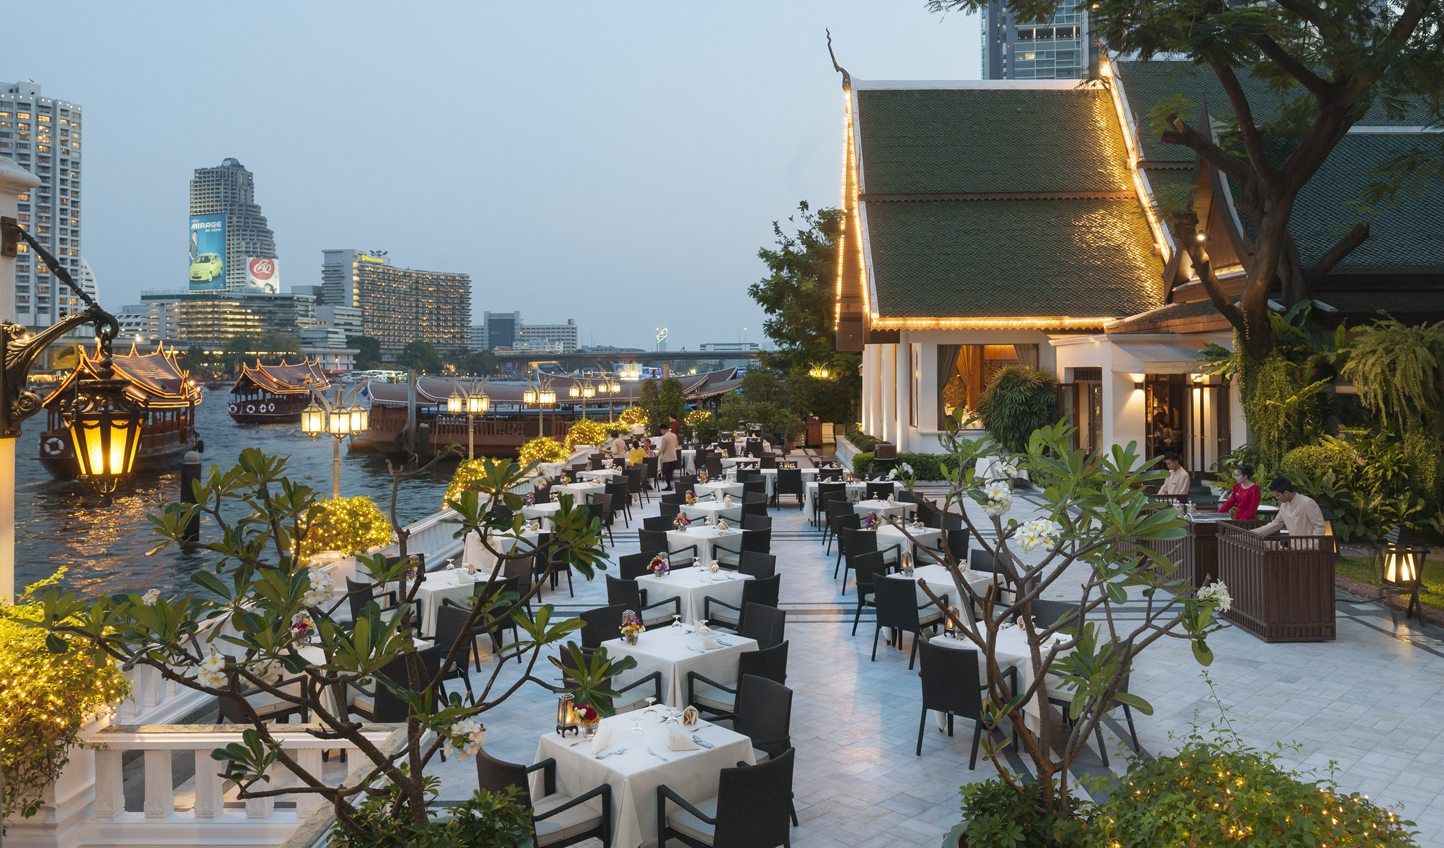 Savour authentic Thai cuisine on the Chao Phraya River